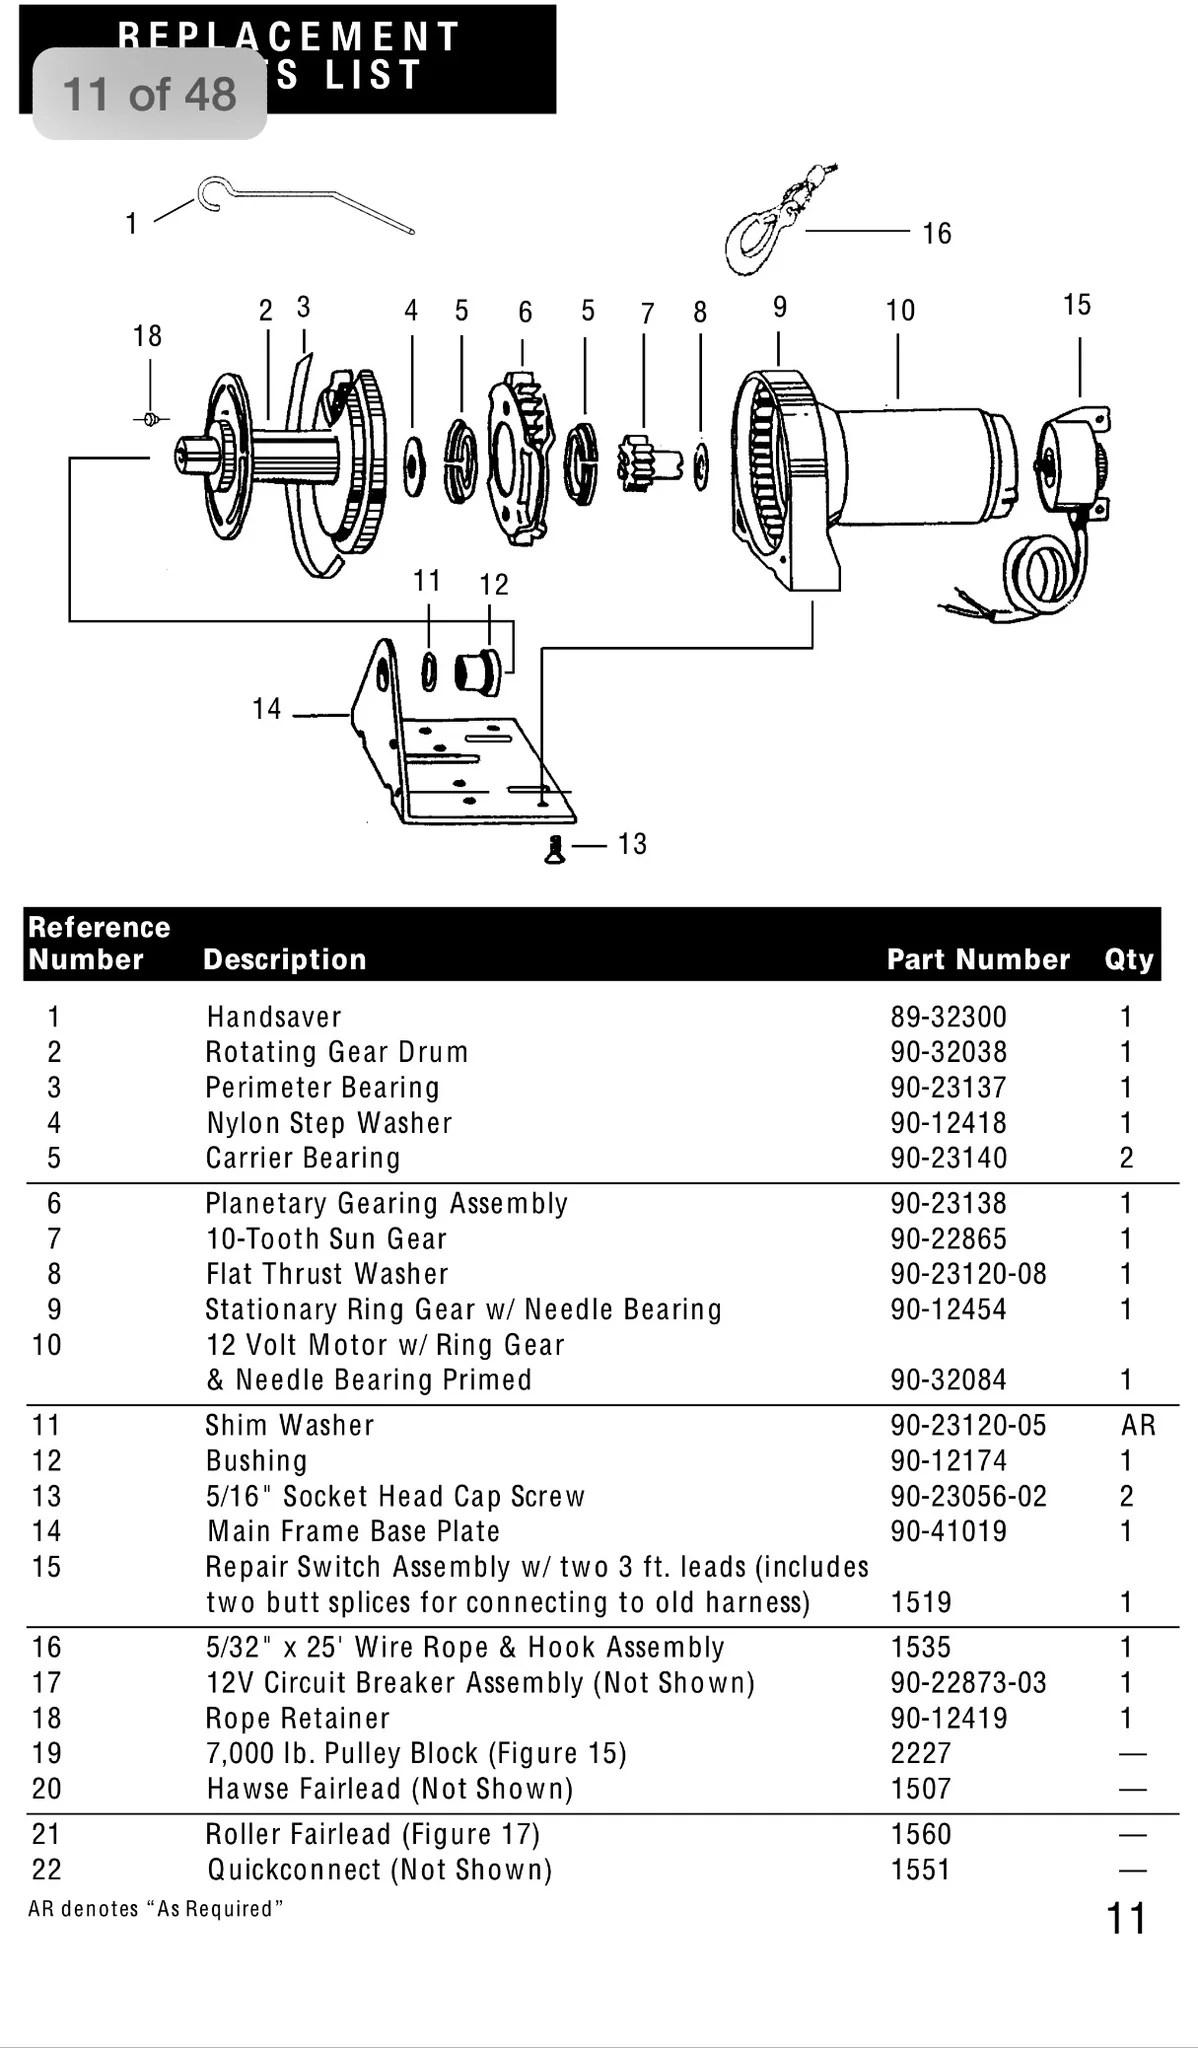 medium resolution of superwinch replacement motor for ex1 superwinch atv wiring diagram superwinch parts diagram